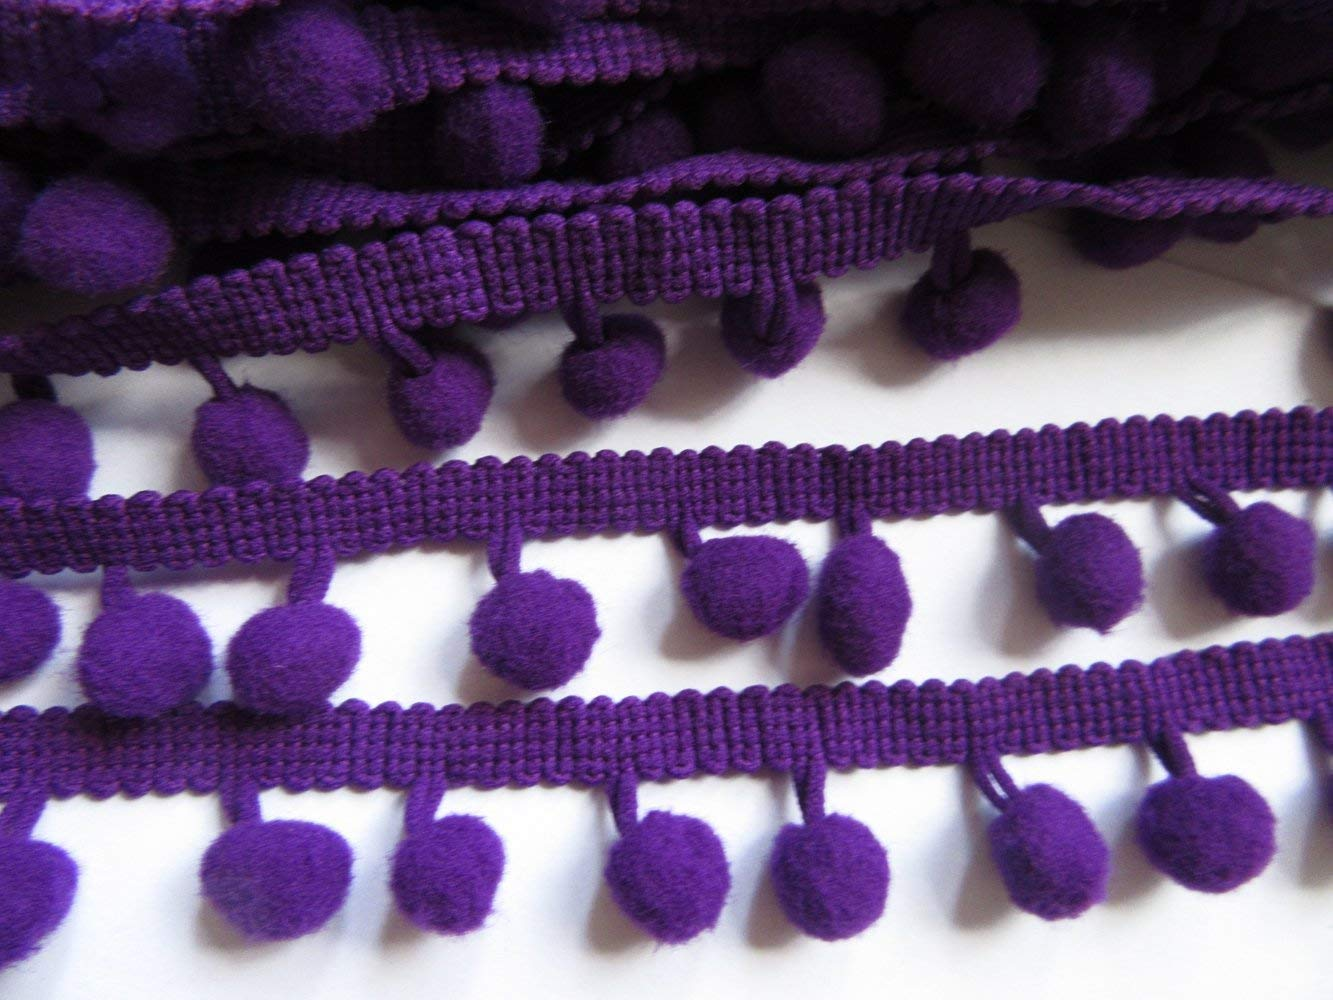 Teemico 20 Yards Mini Pom Pom Trim Ball Fringe Ribbon Sew on Pom Pom Fringe Tassel Lace for DIY Sewing Accessory red